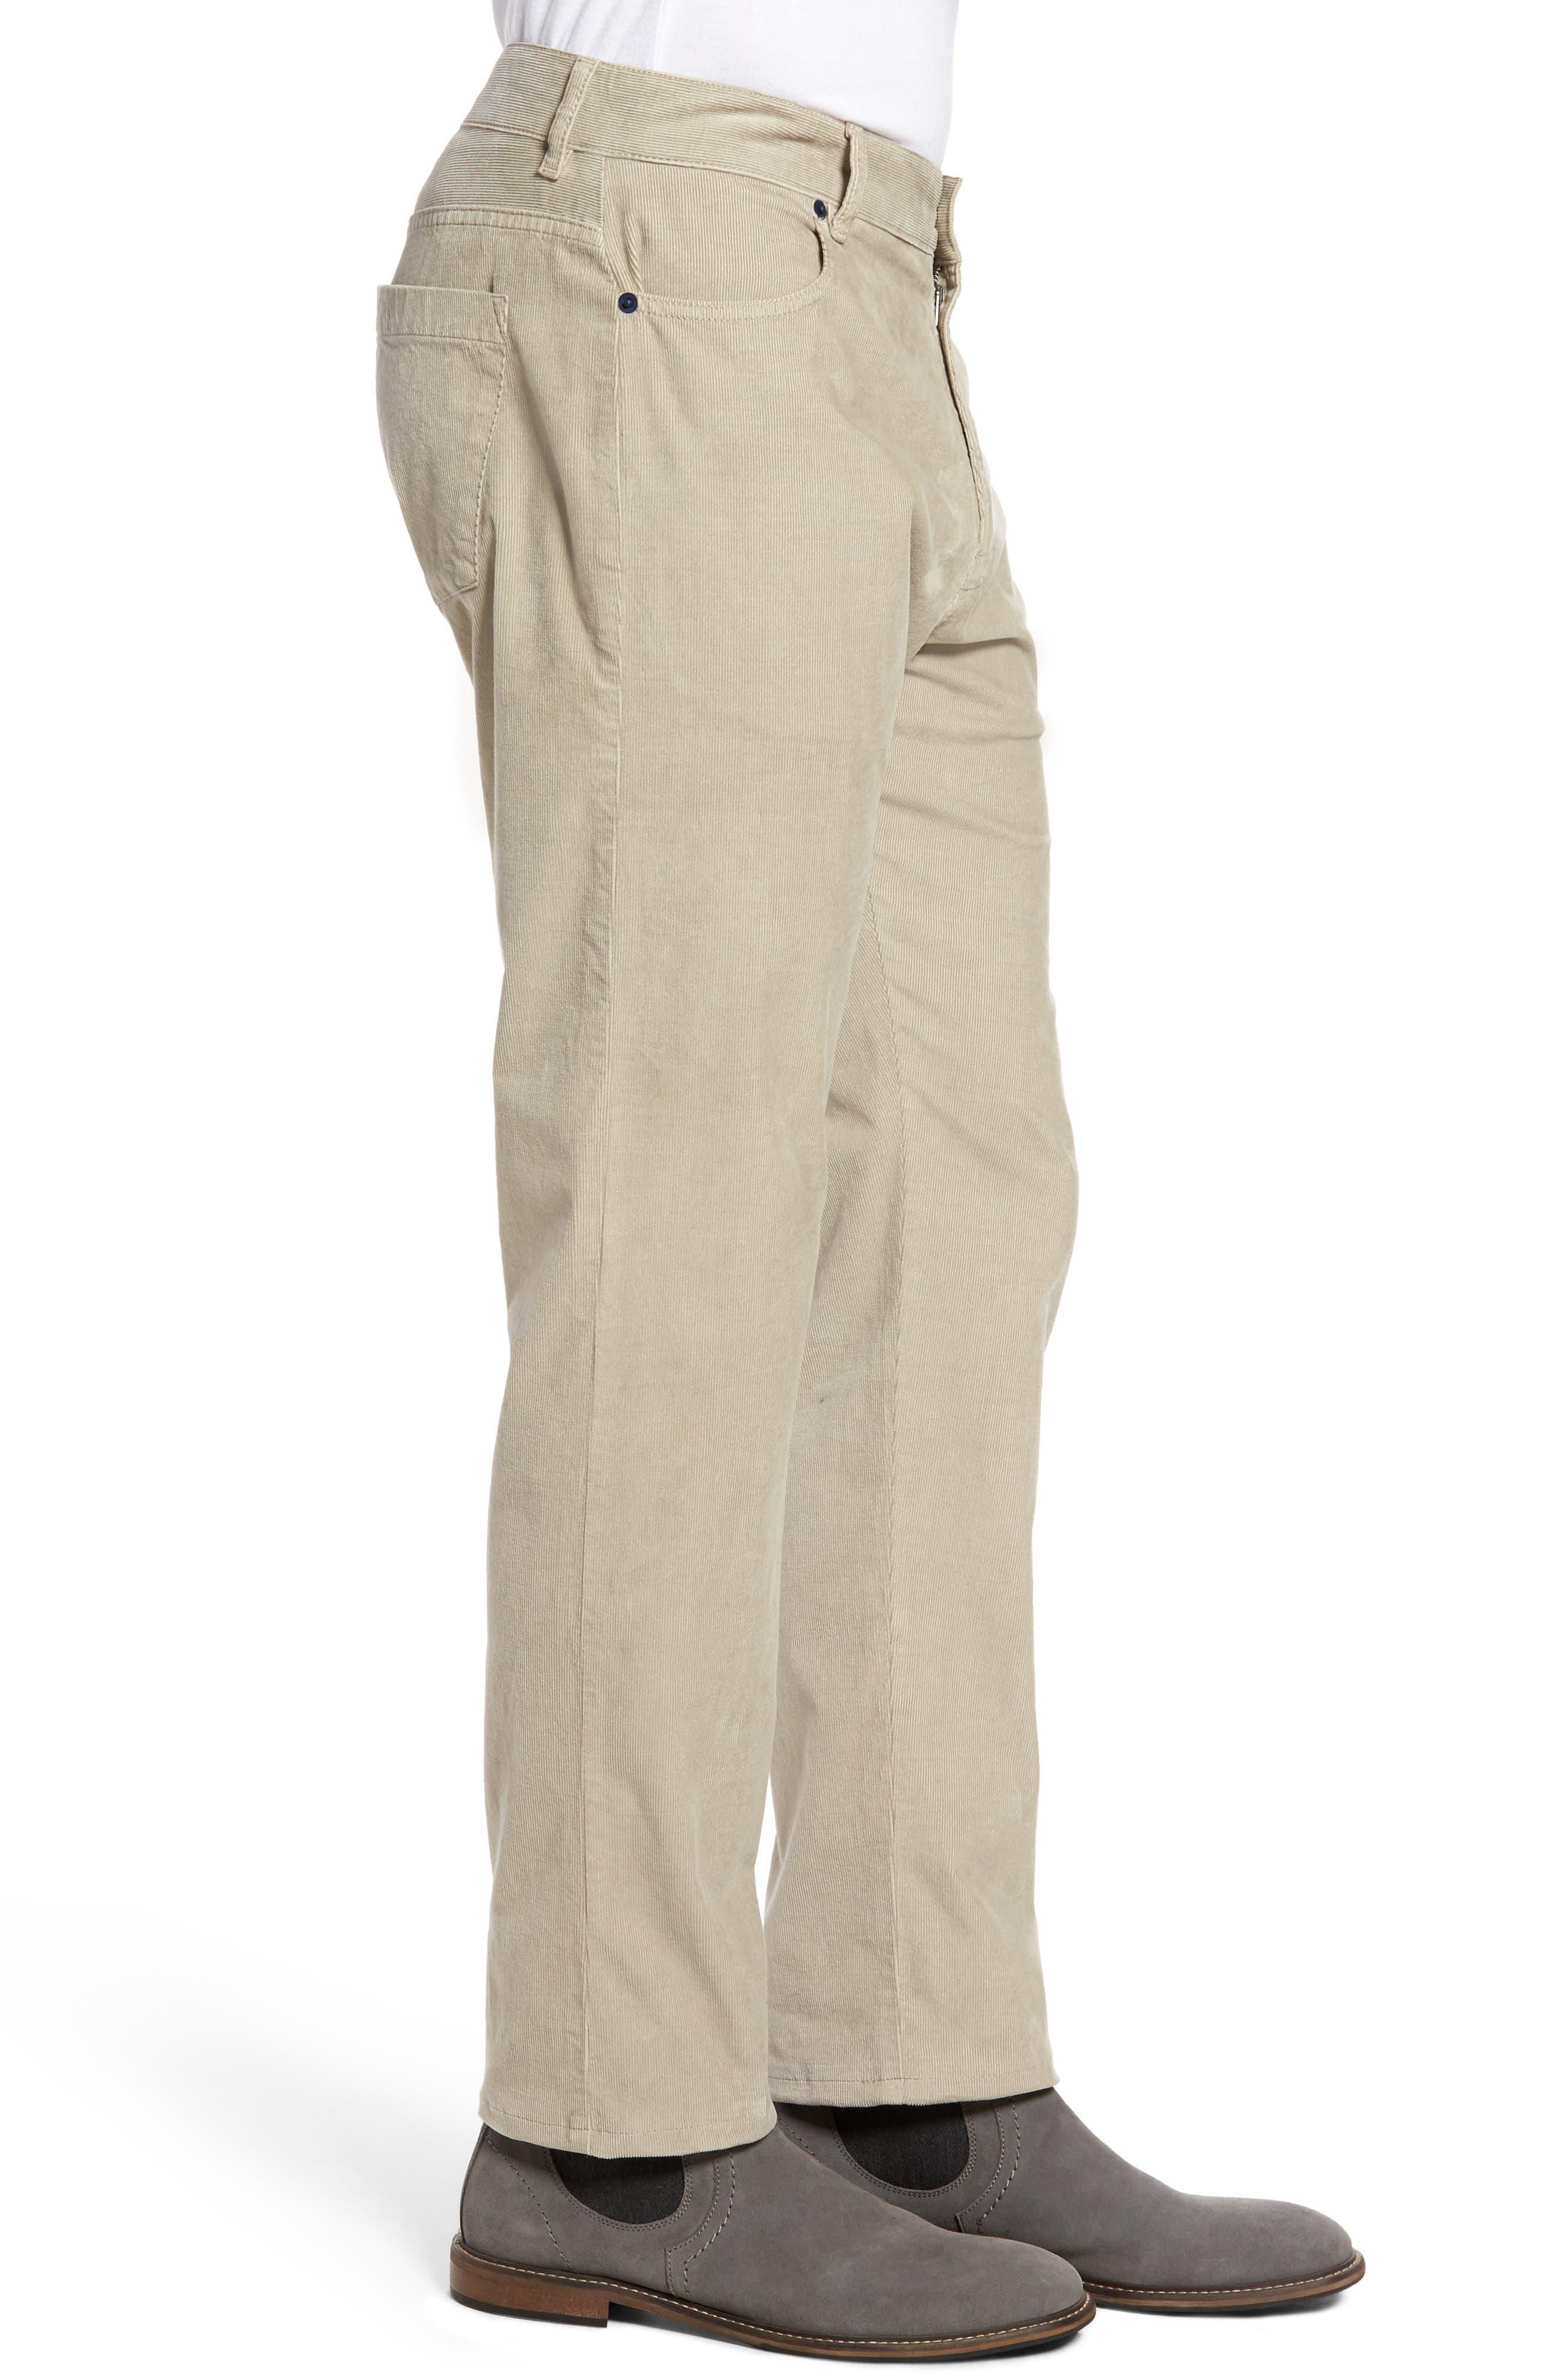 Redonda Stretch Corduroy Trousers,                             Alternate thumbnail 3, color,                             252